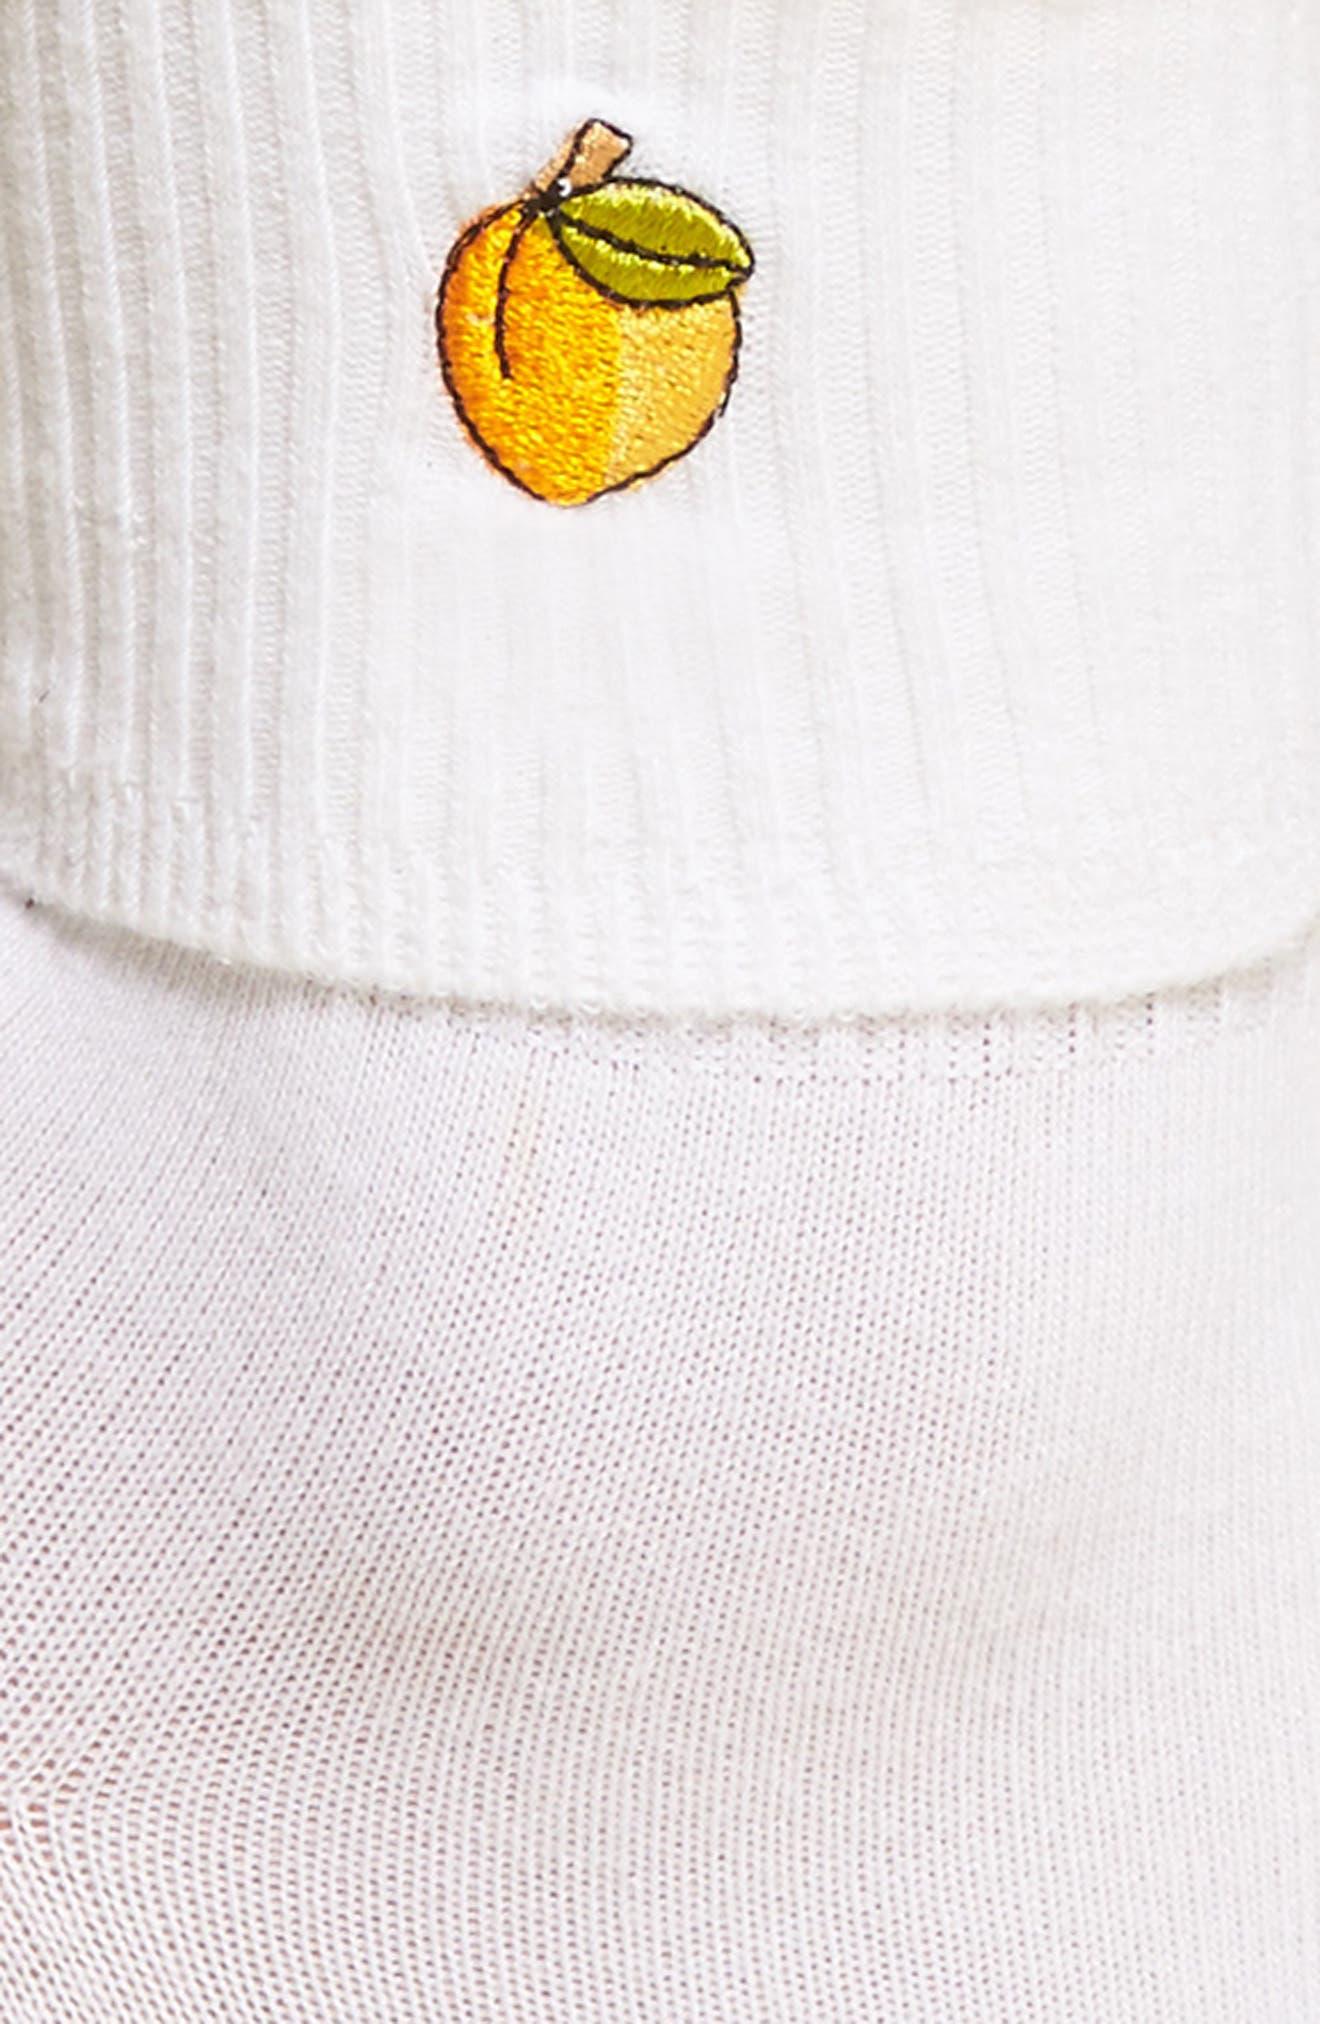 Peach Socks,                             Alternate thumbnail 2, color,                             700